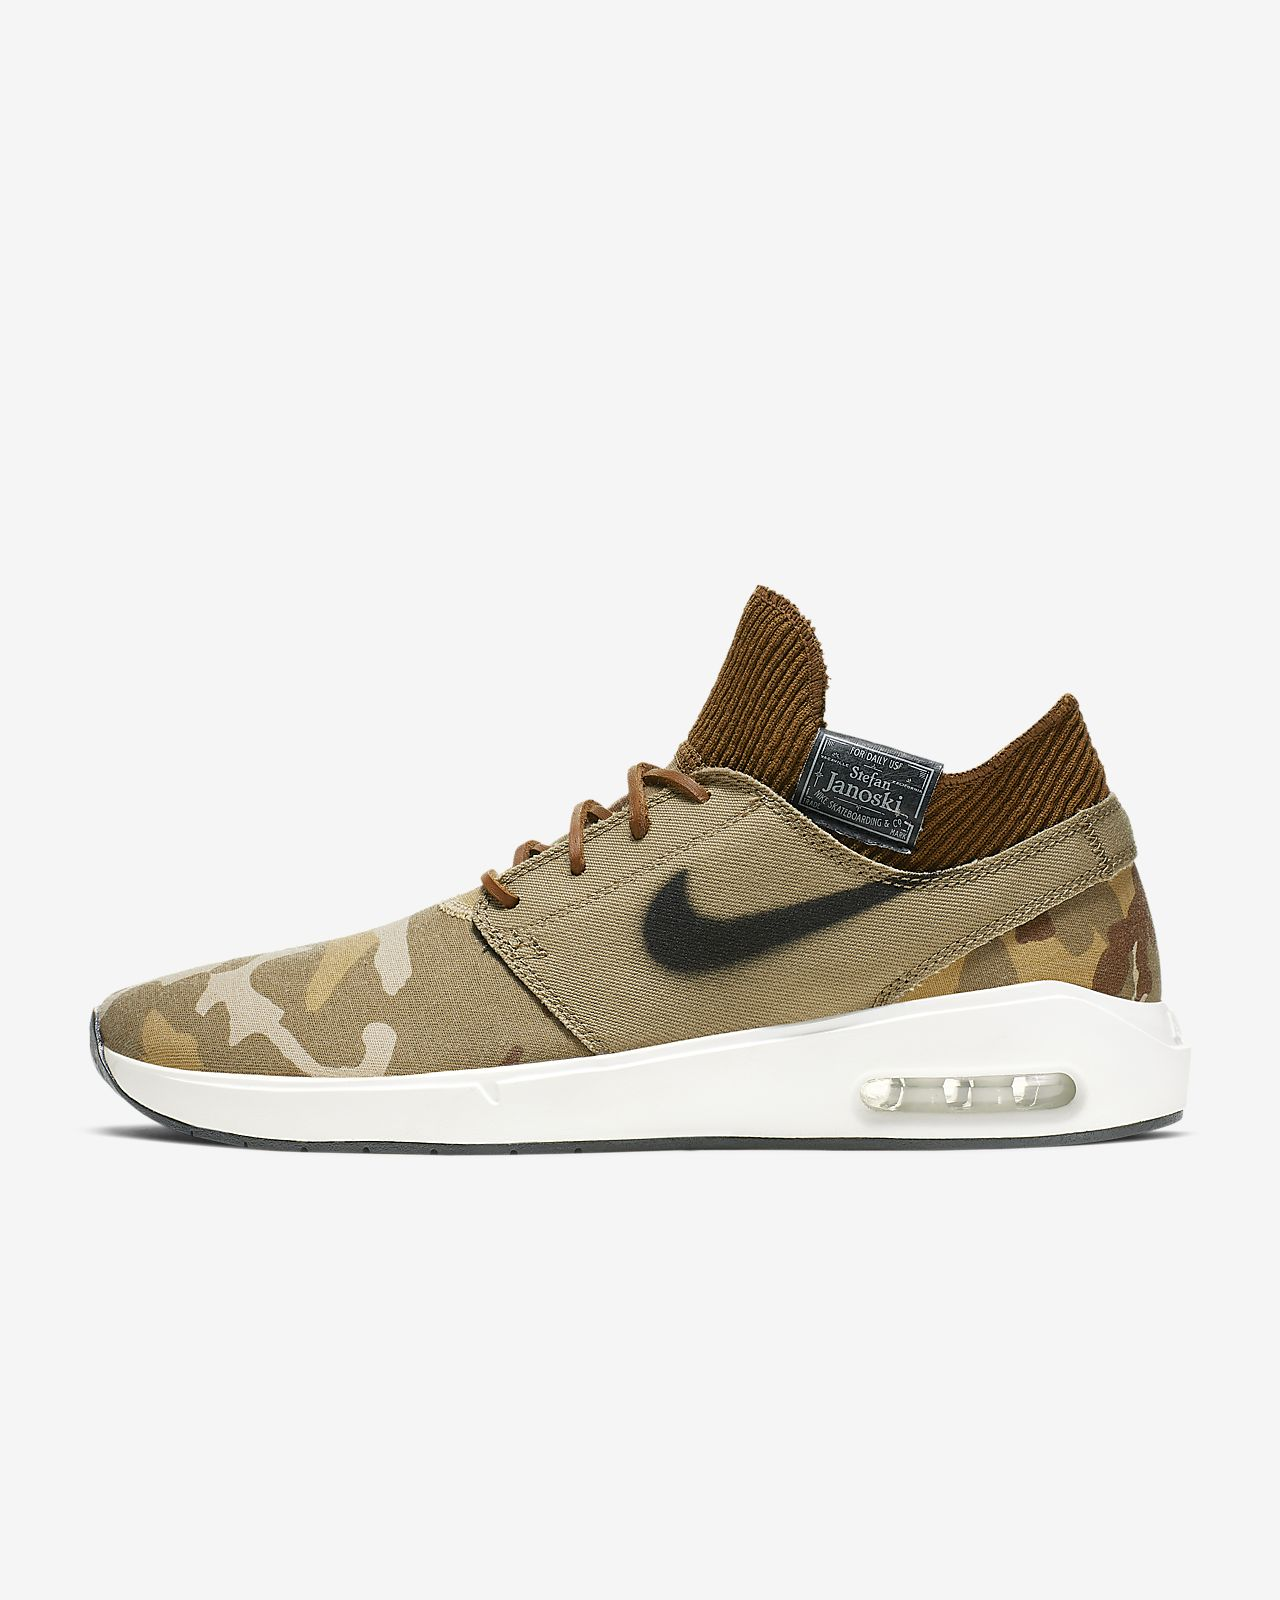 Nike SB Air Max Stefan Janoski 2 Premium férfi gördeszkás cipő